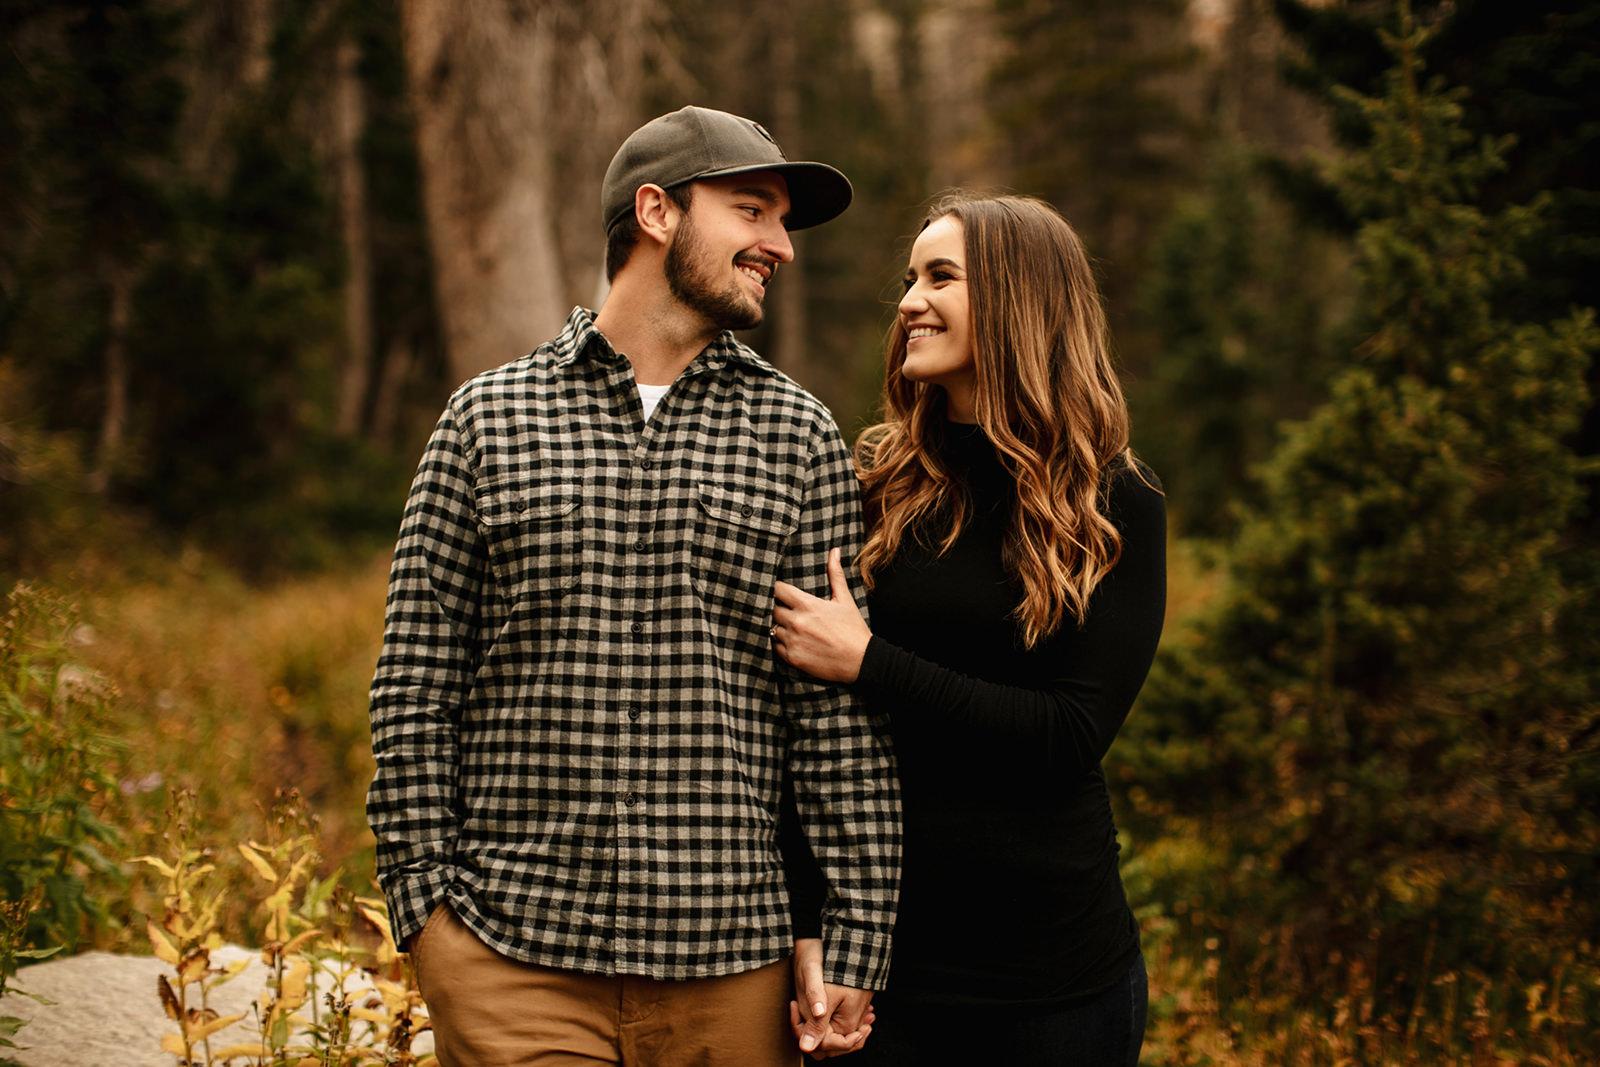 Liz Osban Photography Cheyenne Wyoming Engagement Wedding Photographer couple adventure elopement wedding laramie denver fort collins colorado rocky mountain national park5.jpg